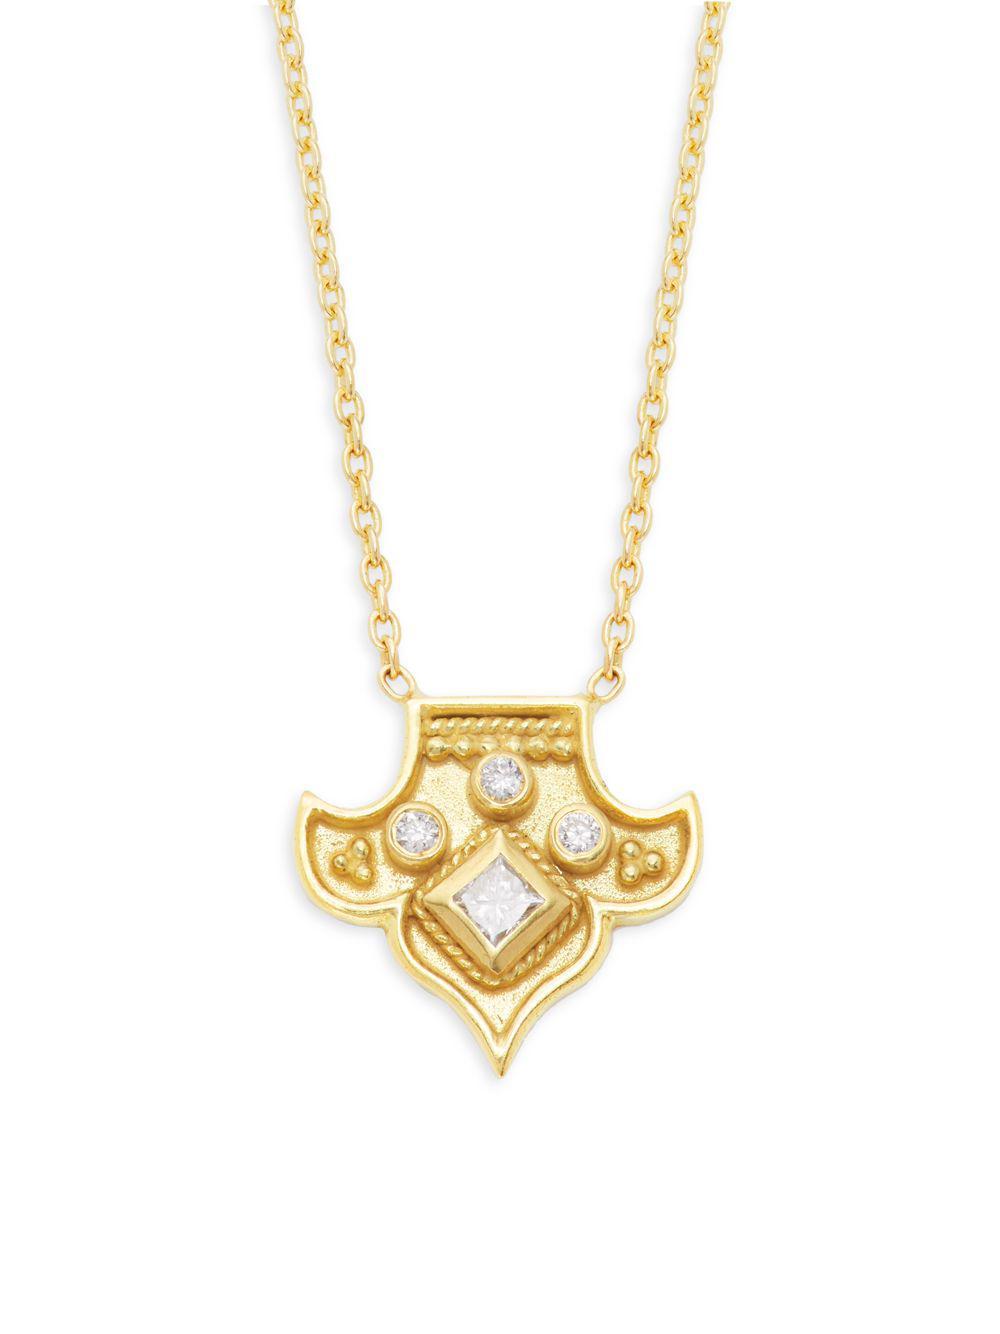 74490712d7b7 Amrapali - Metallic Heritage 18k Yellow Gold   Diamond Fleur Pendant  Necklace - Lyst. View fullscreen